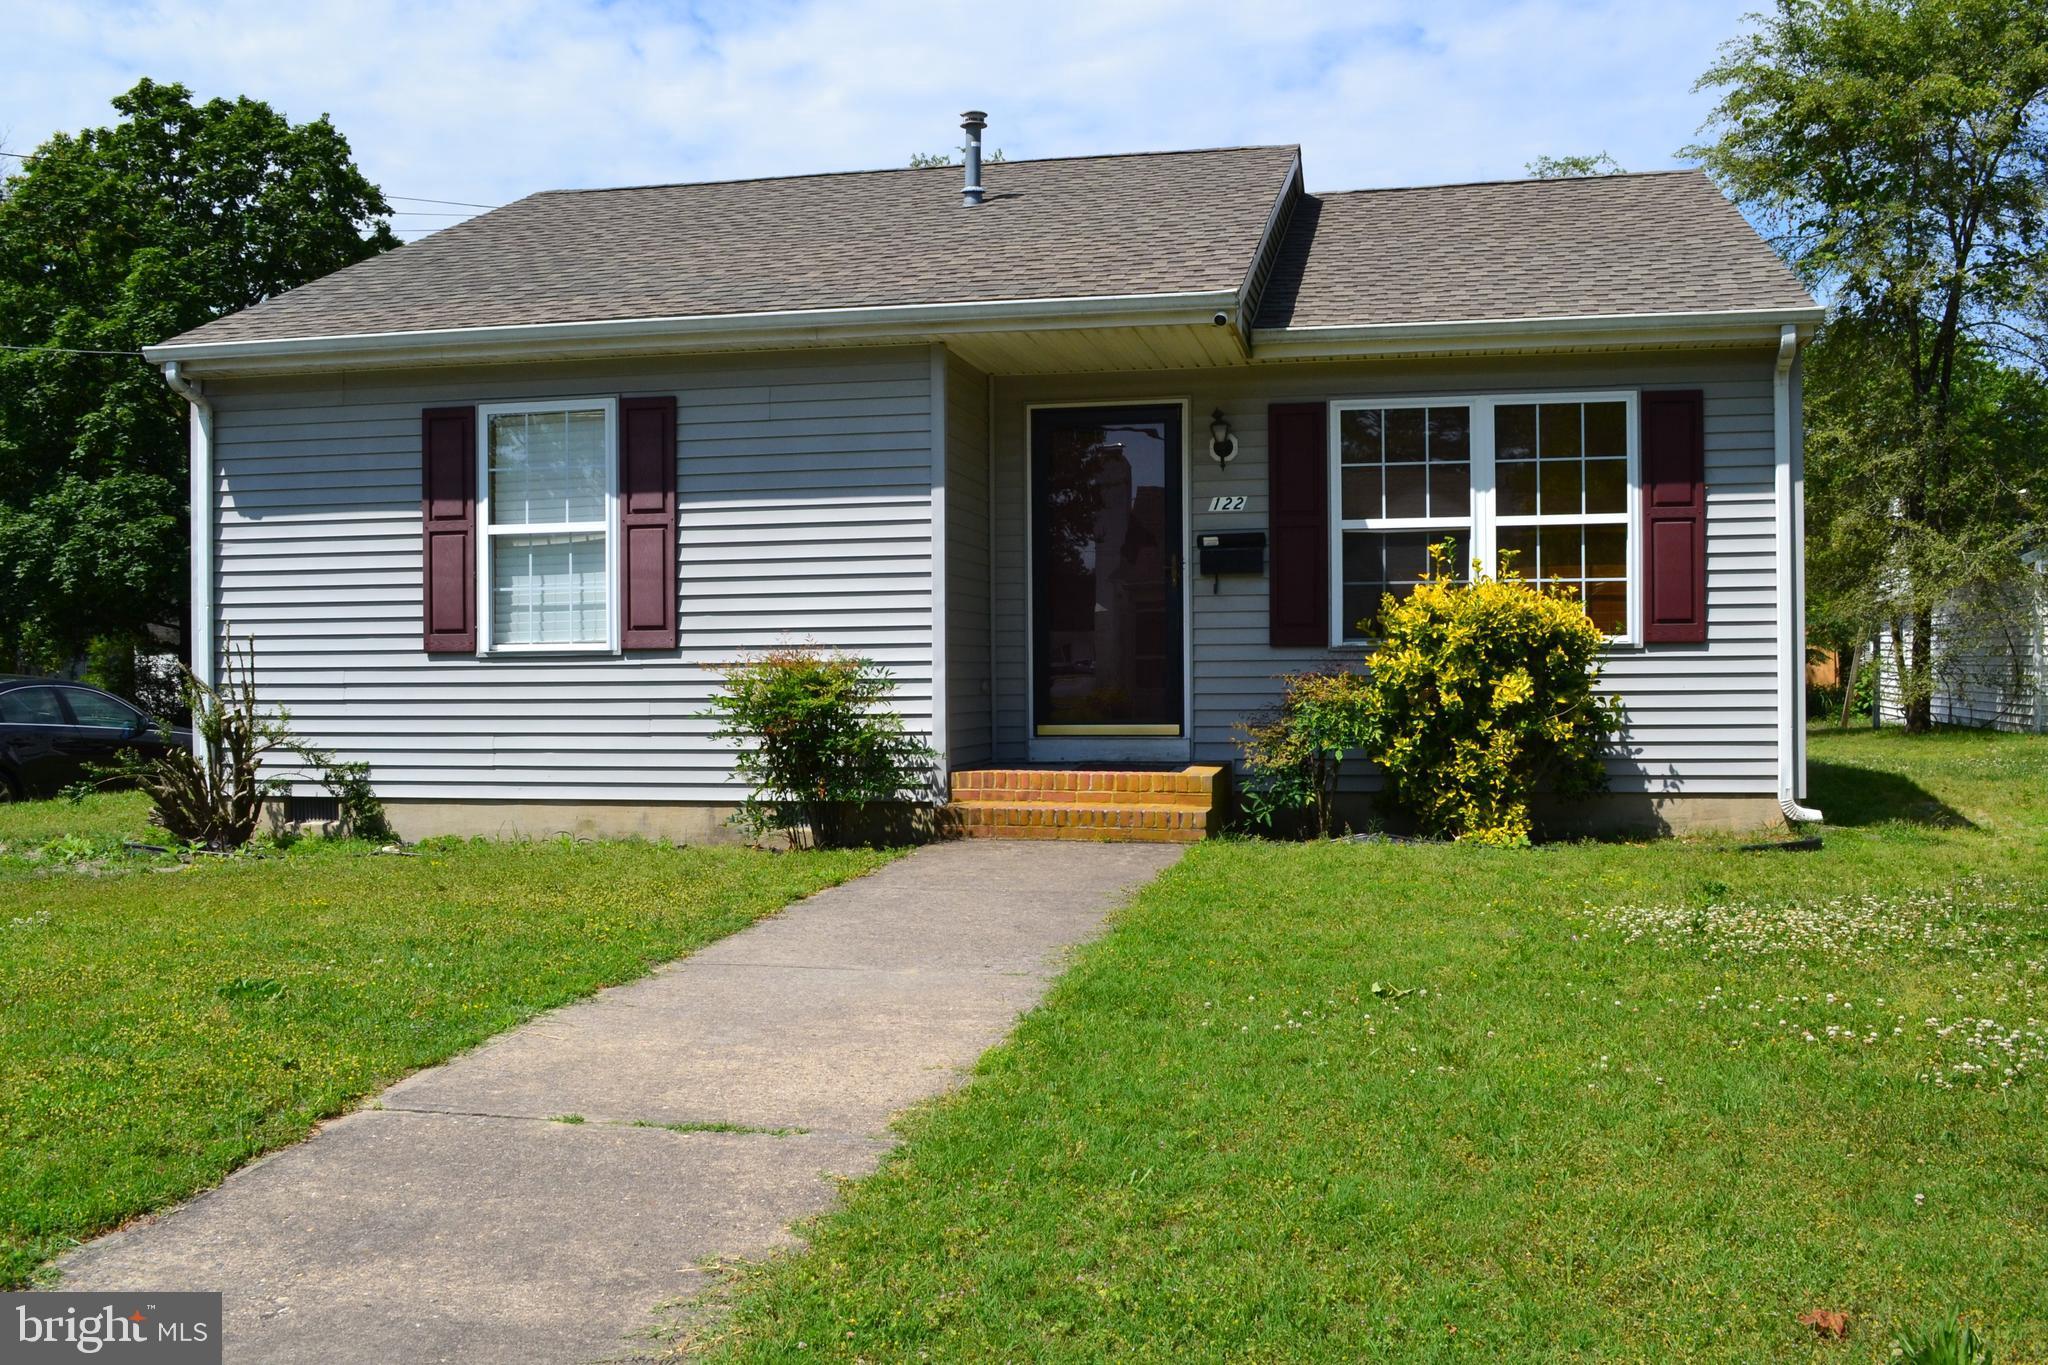 122 Holland Ave, Salisbury, MD, 21804